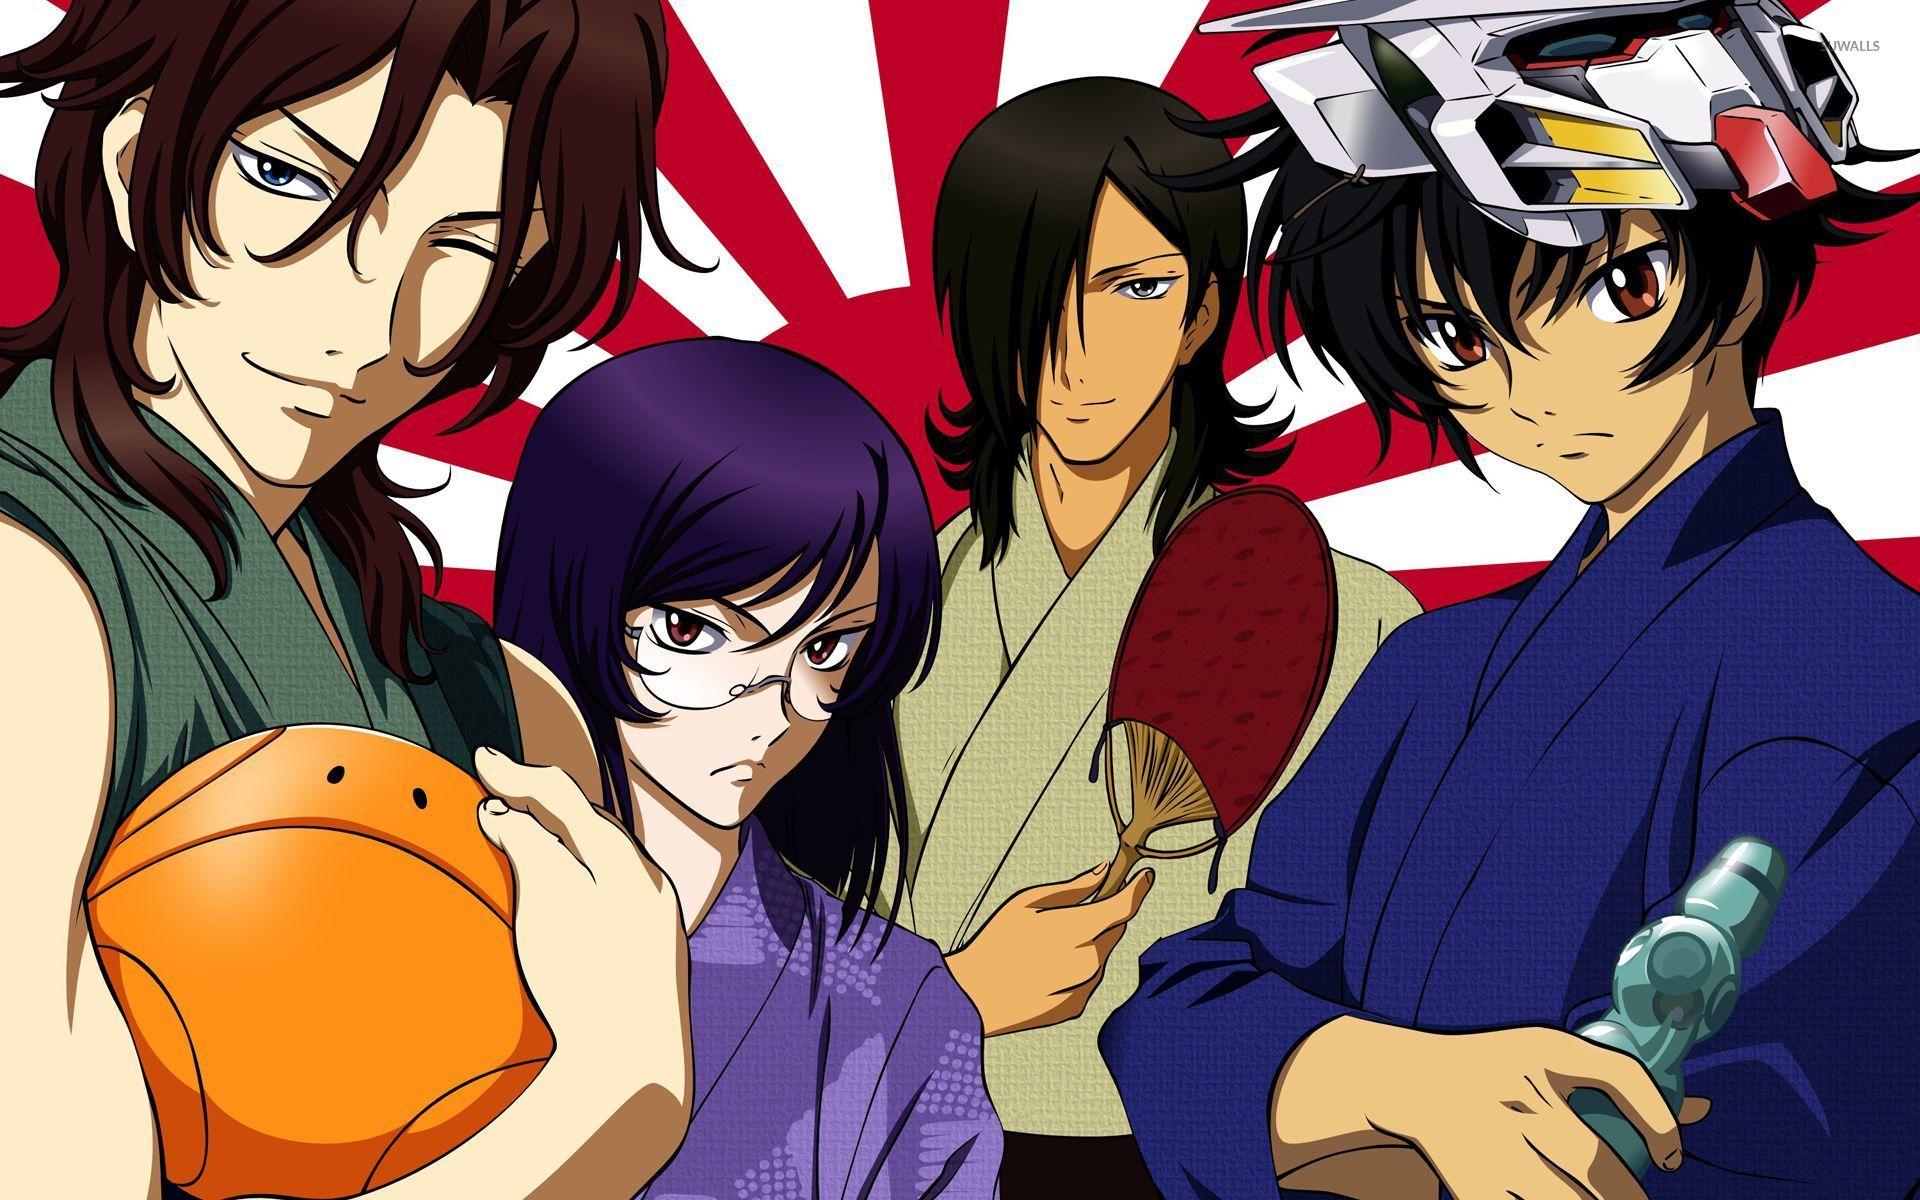 Mobile Suit Gundam 00 3 Wallpaper Anime Wallpapers 8830